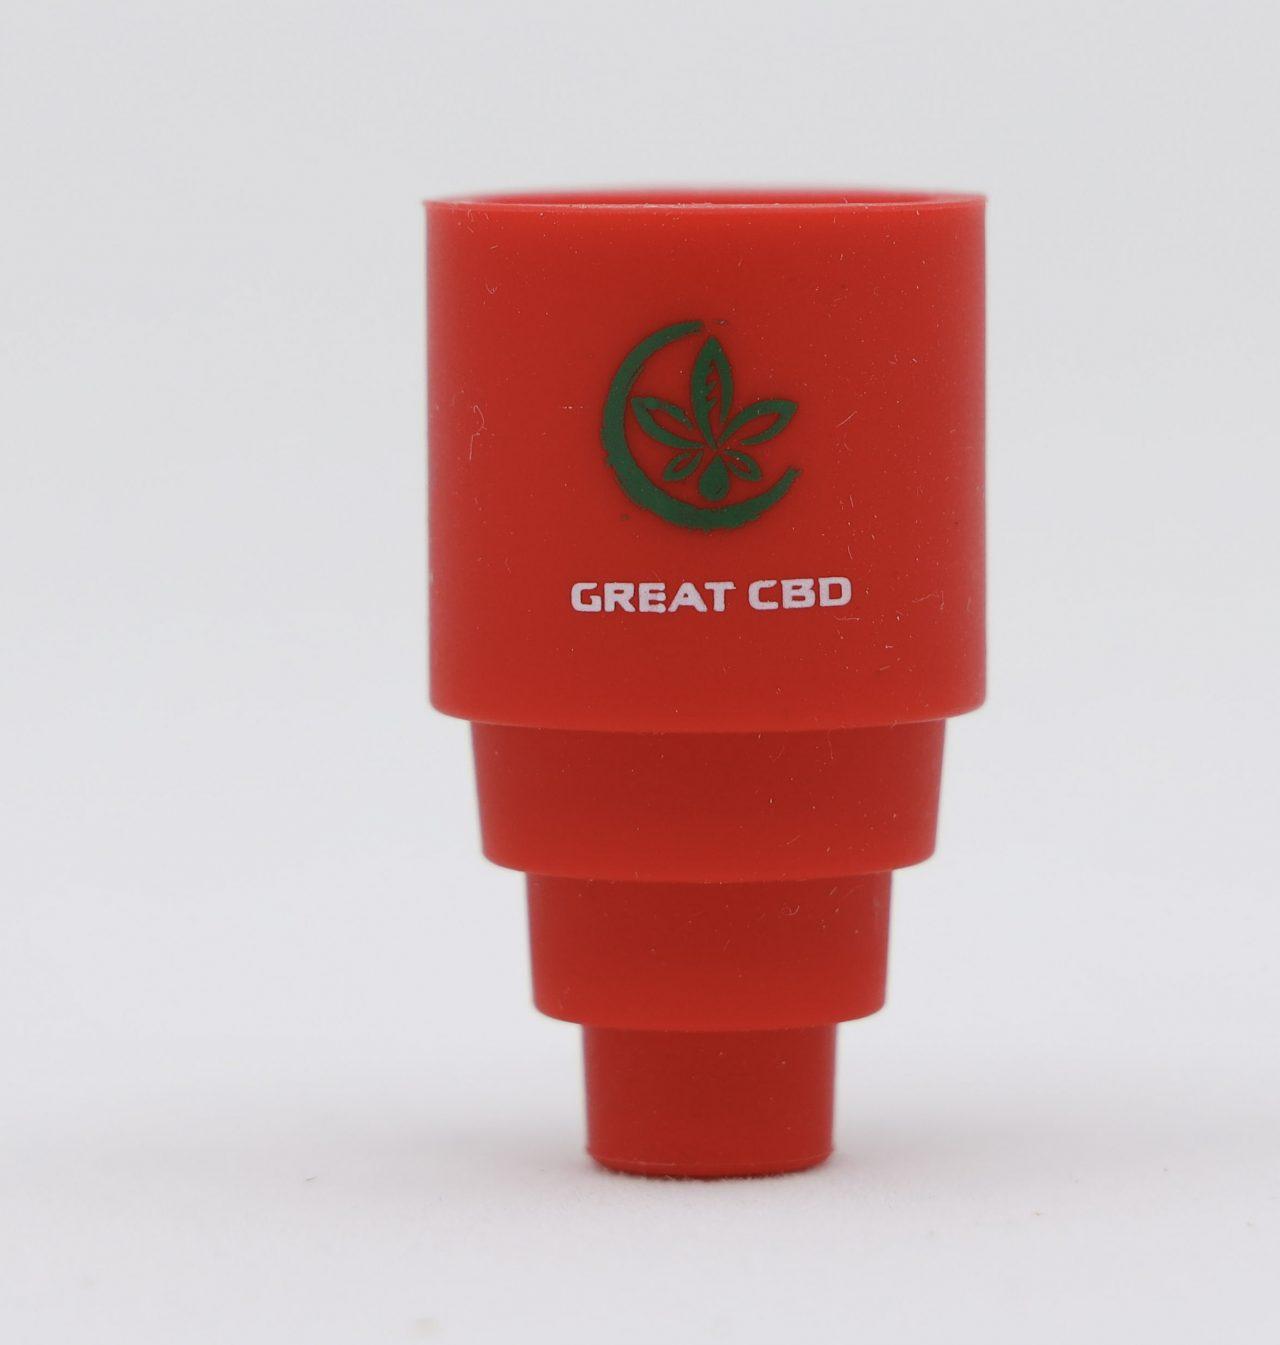 Great CBD Shop G Cap DabCap 3